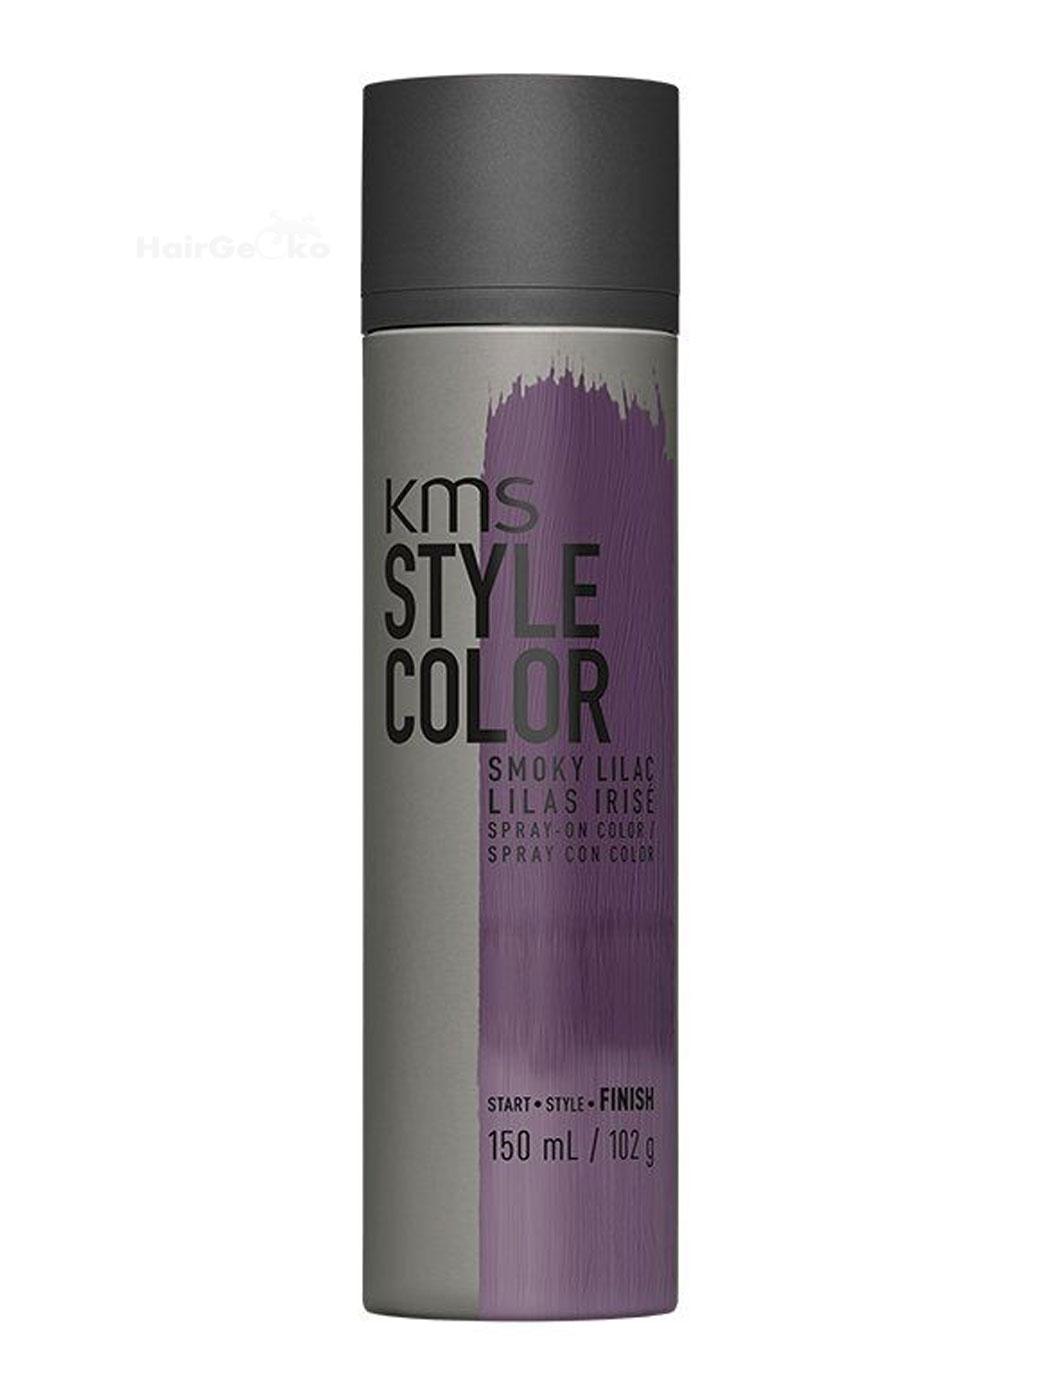 KMS Style Color Smoky Lilac Finish temporäres Farbspray Haarfarbe 150ml